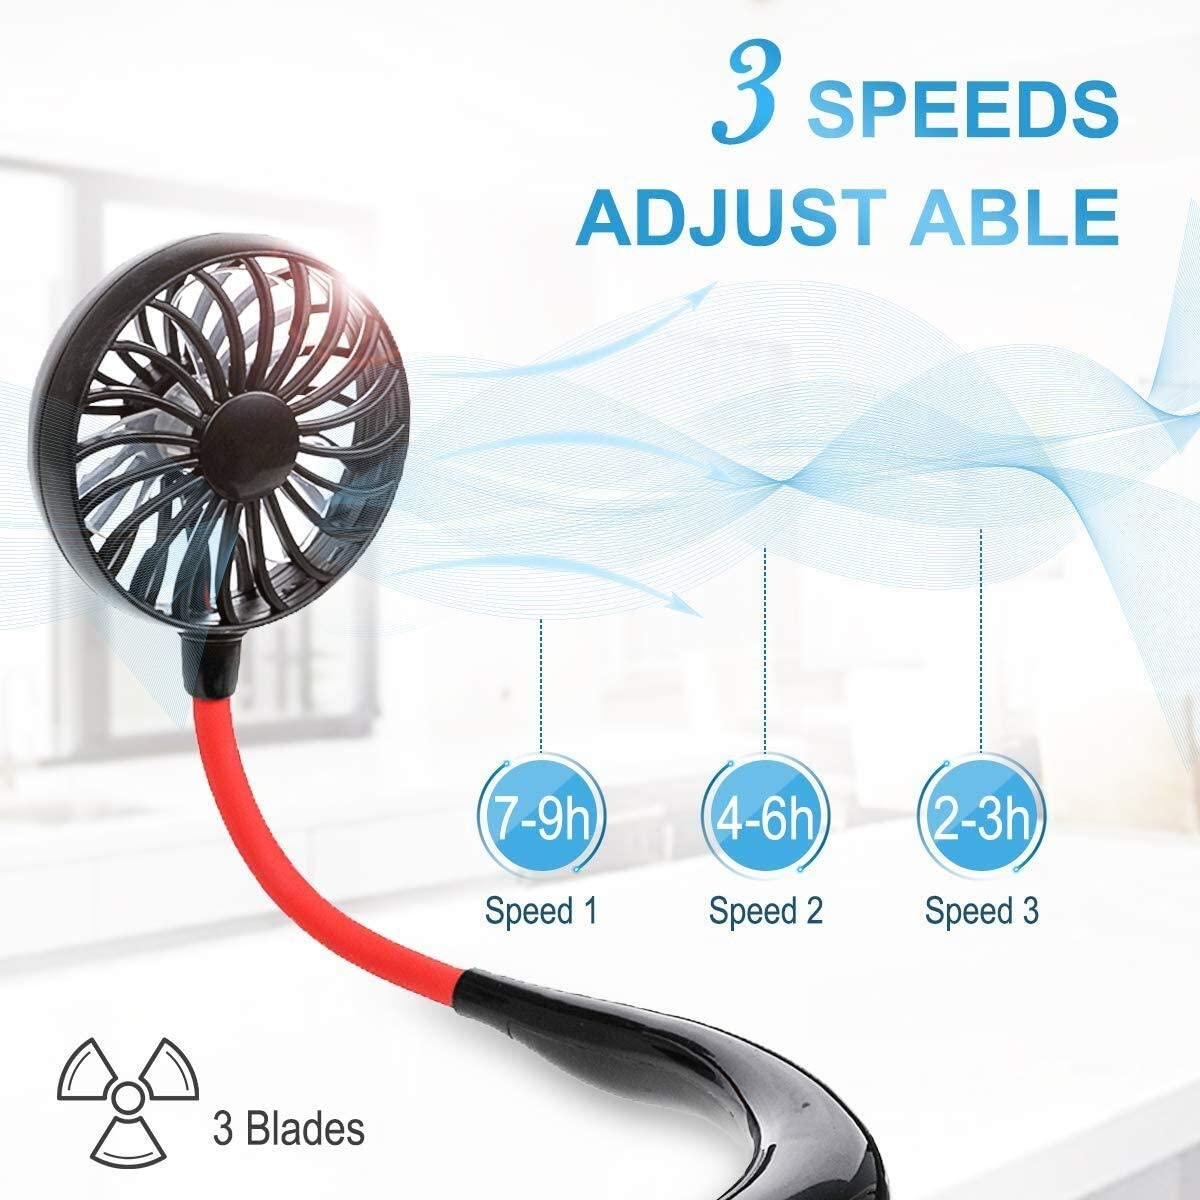 Carprie Fan Mini Portable USB 1200mAh Rechargeable Neckband Lazy Neck Hanging Style Dual Cooling Fans Gadget Inteligente Color : White